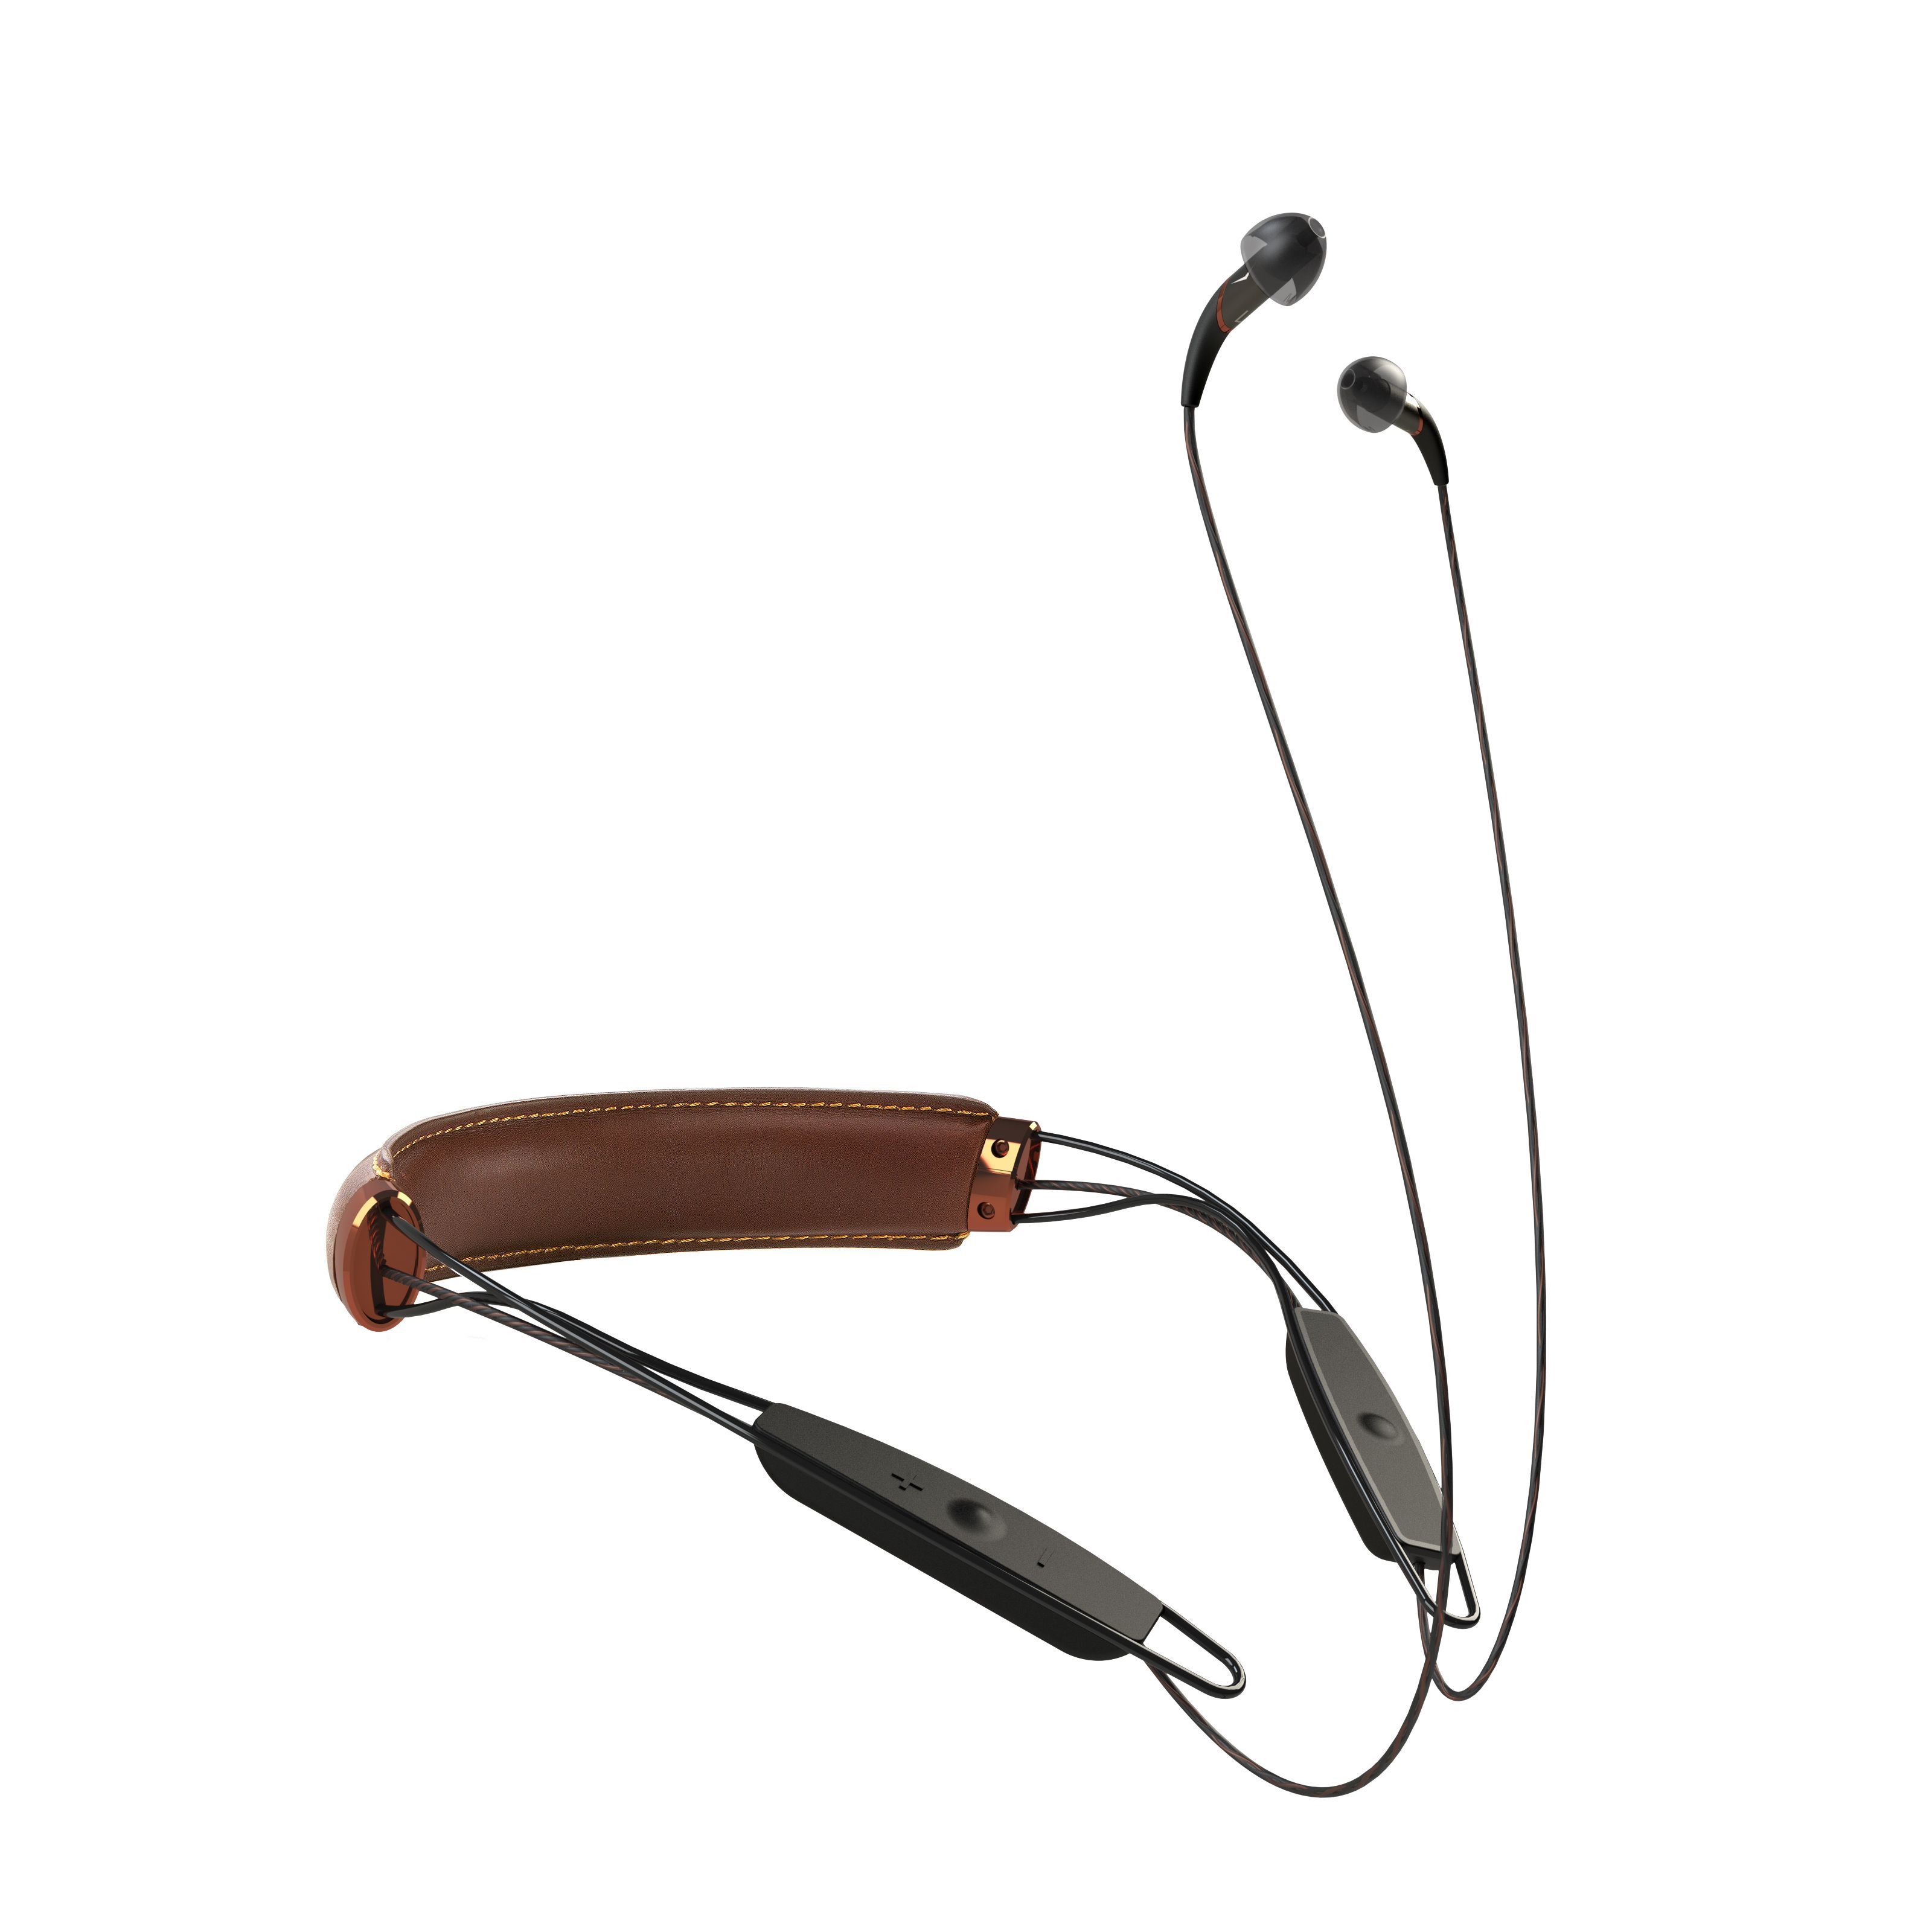 Pin by alinesign on earphones Neckband headphones, Black